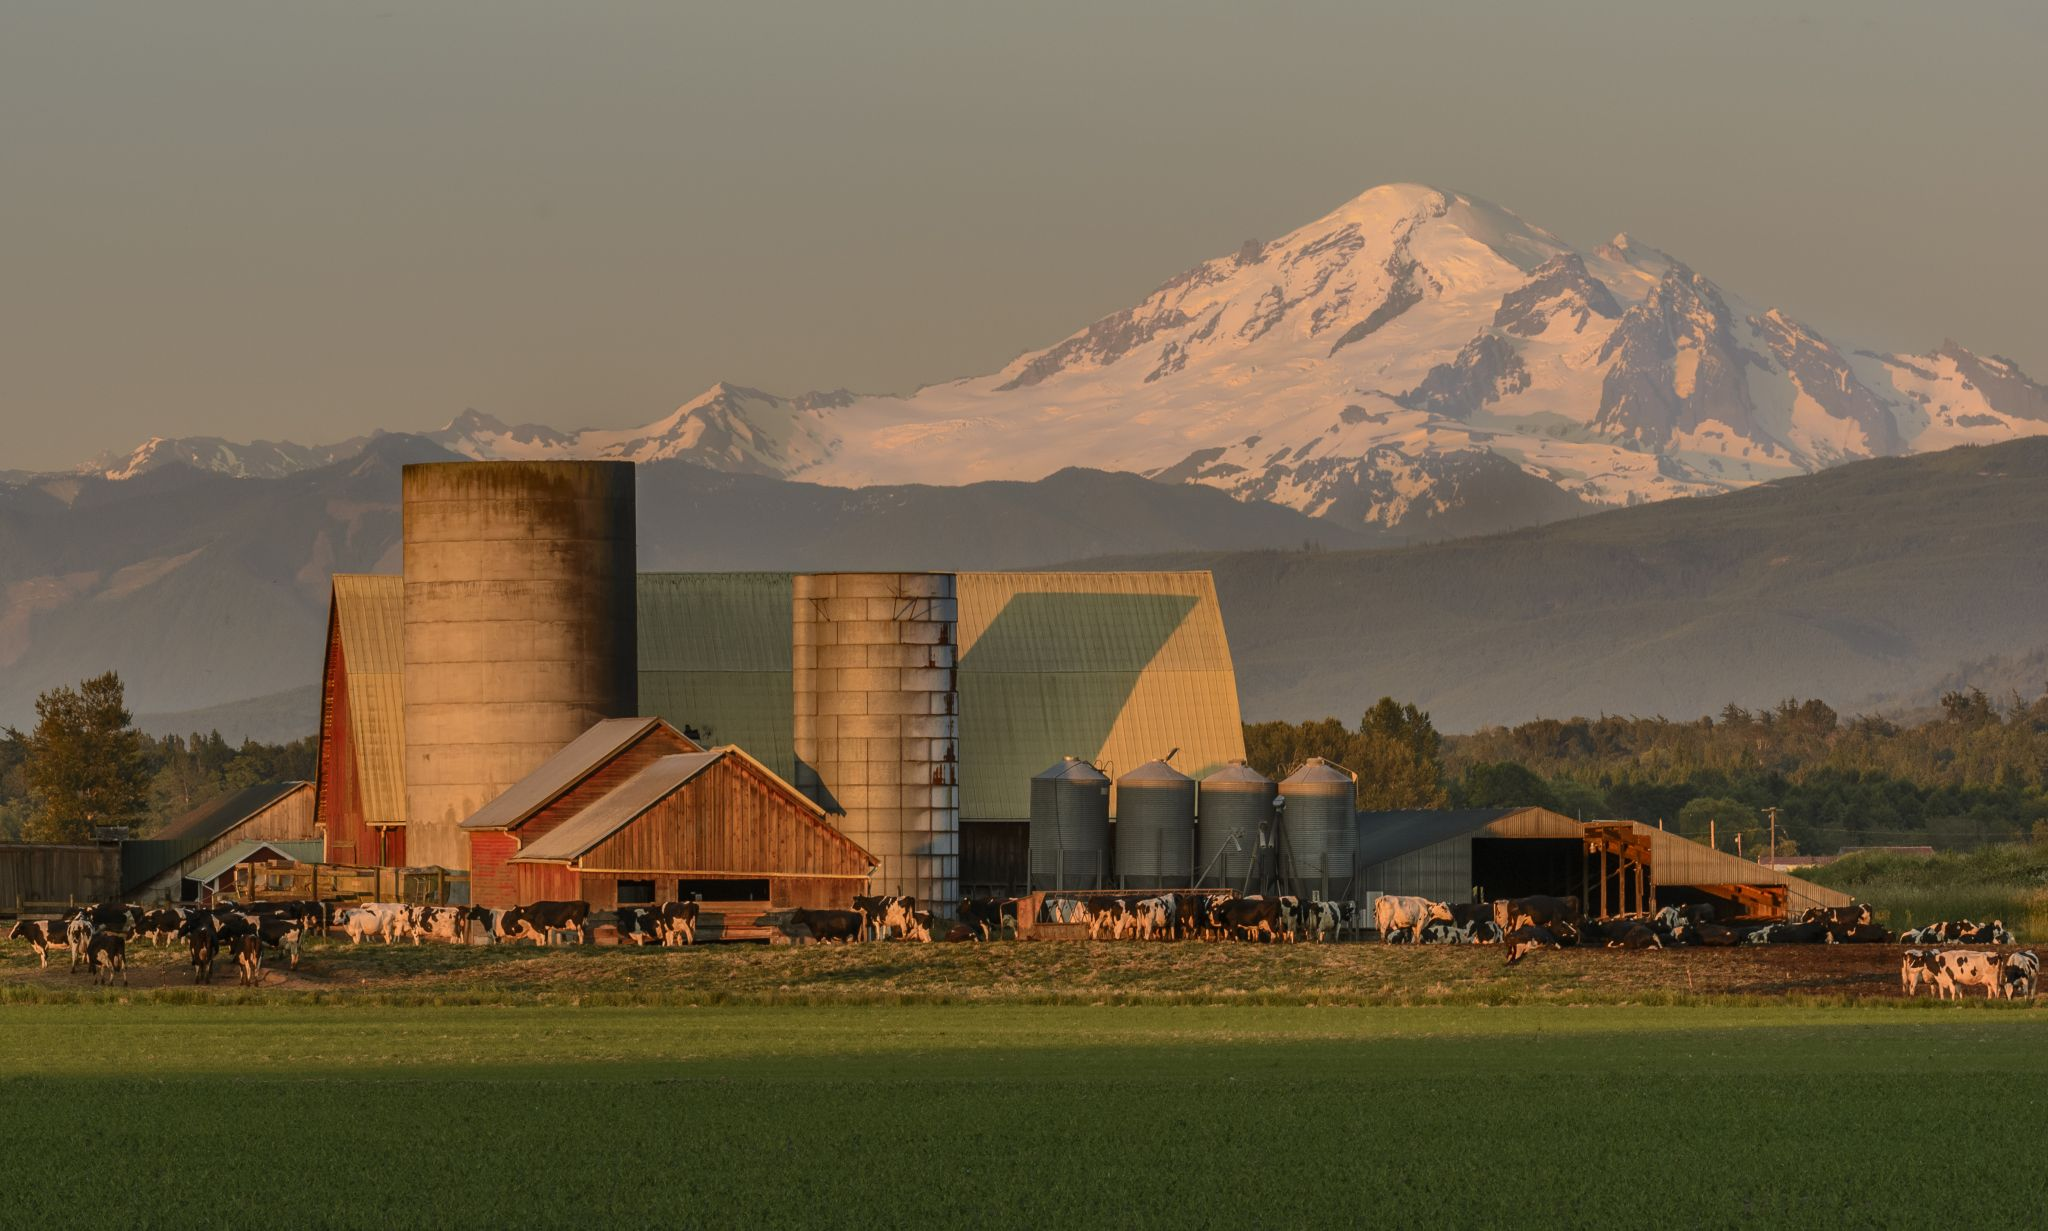 Red River Barn, USA